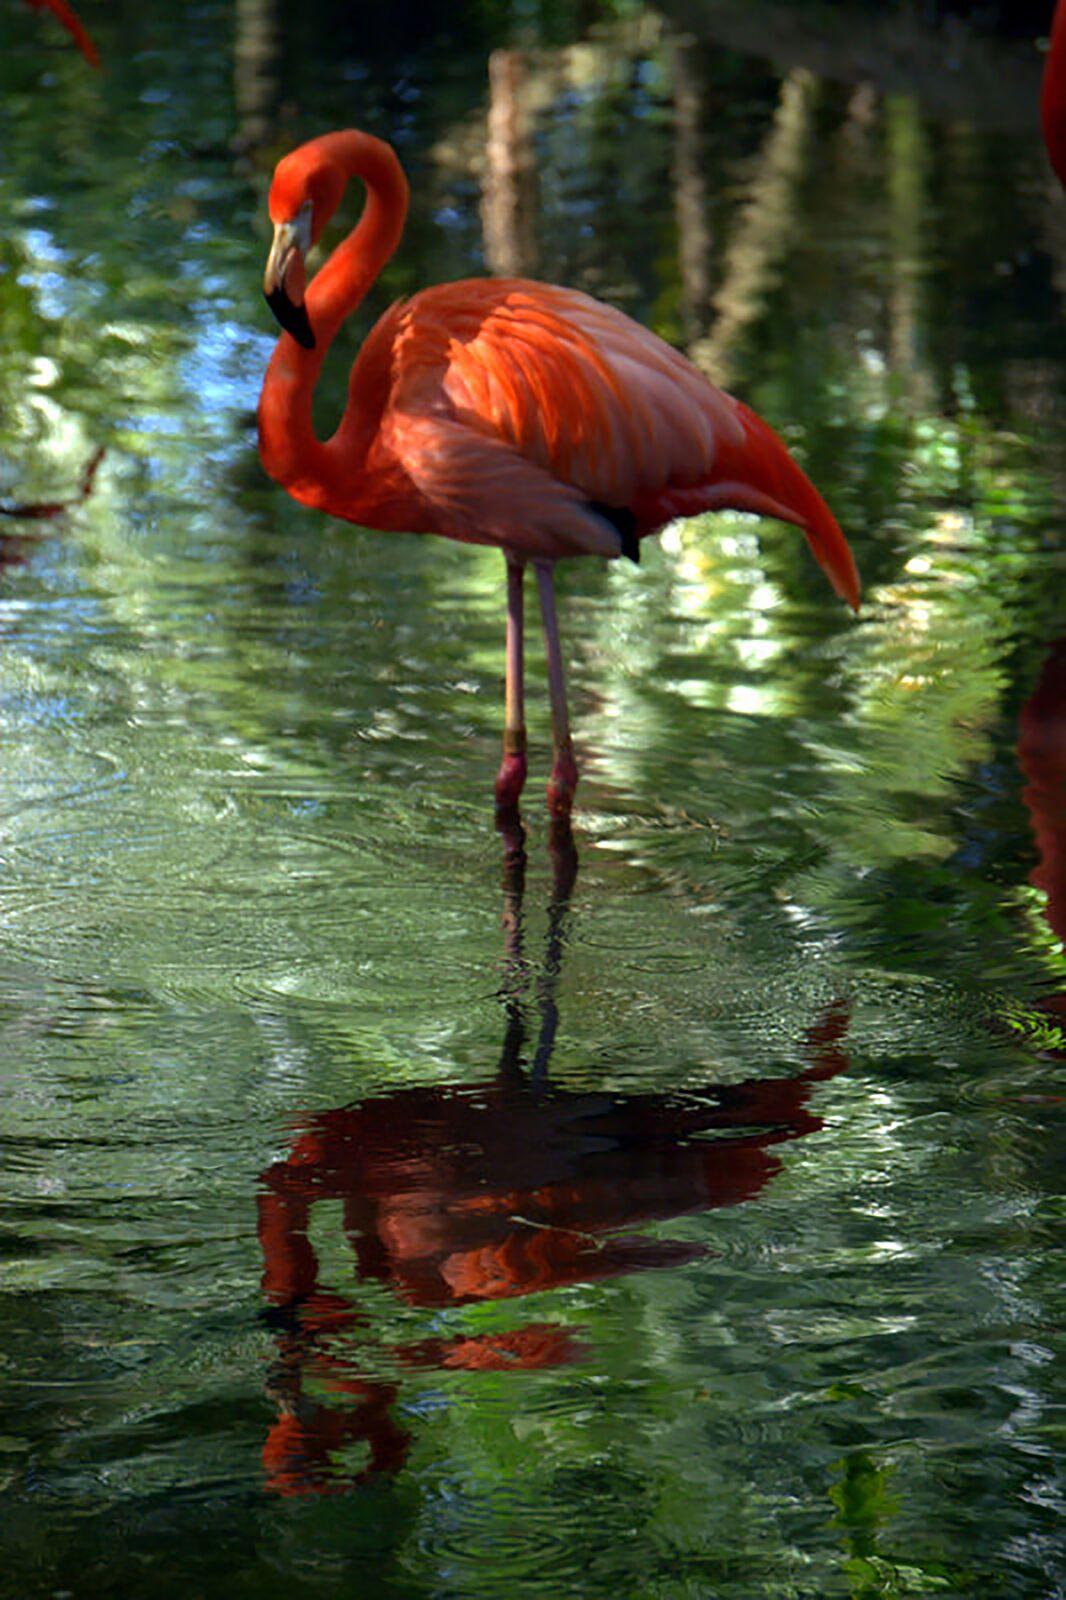 """Flamingo Reflection"" by Nancy Pallowick"